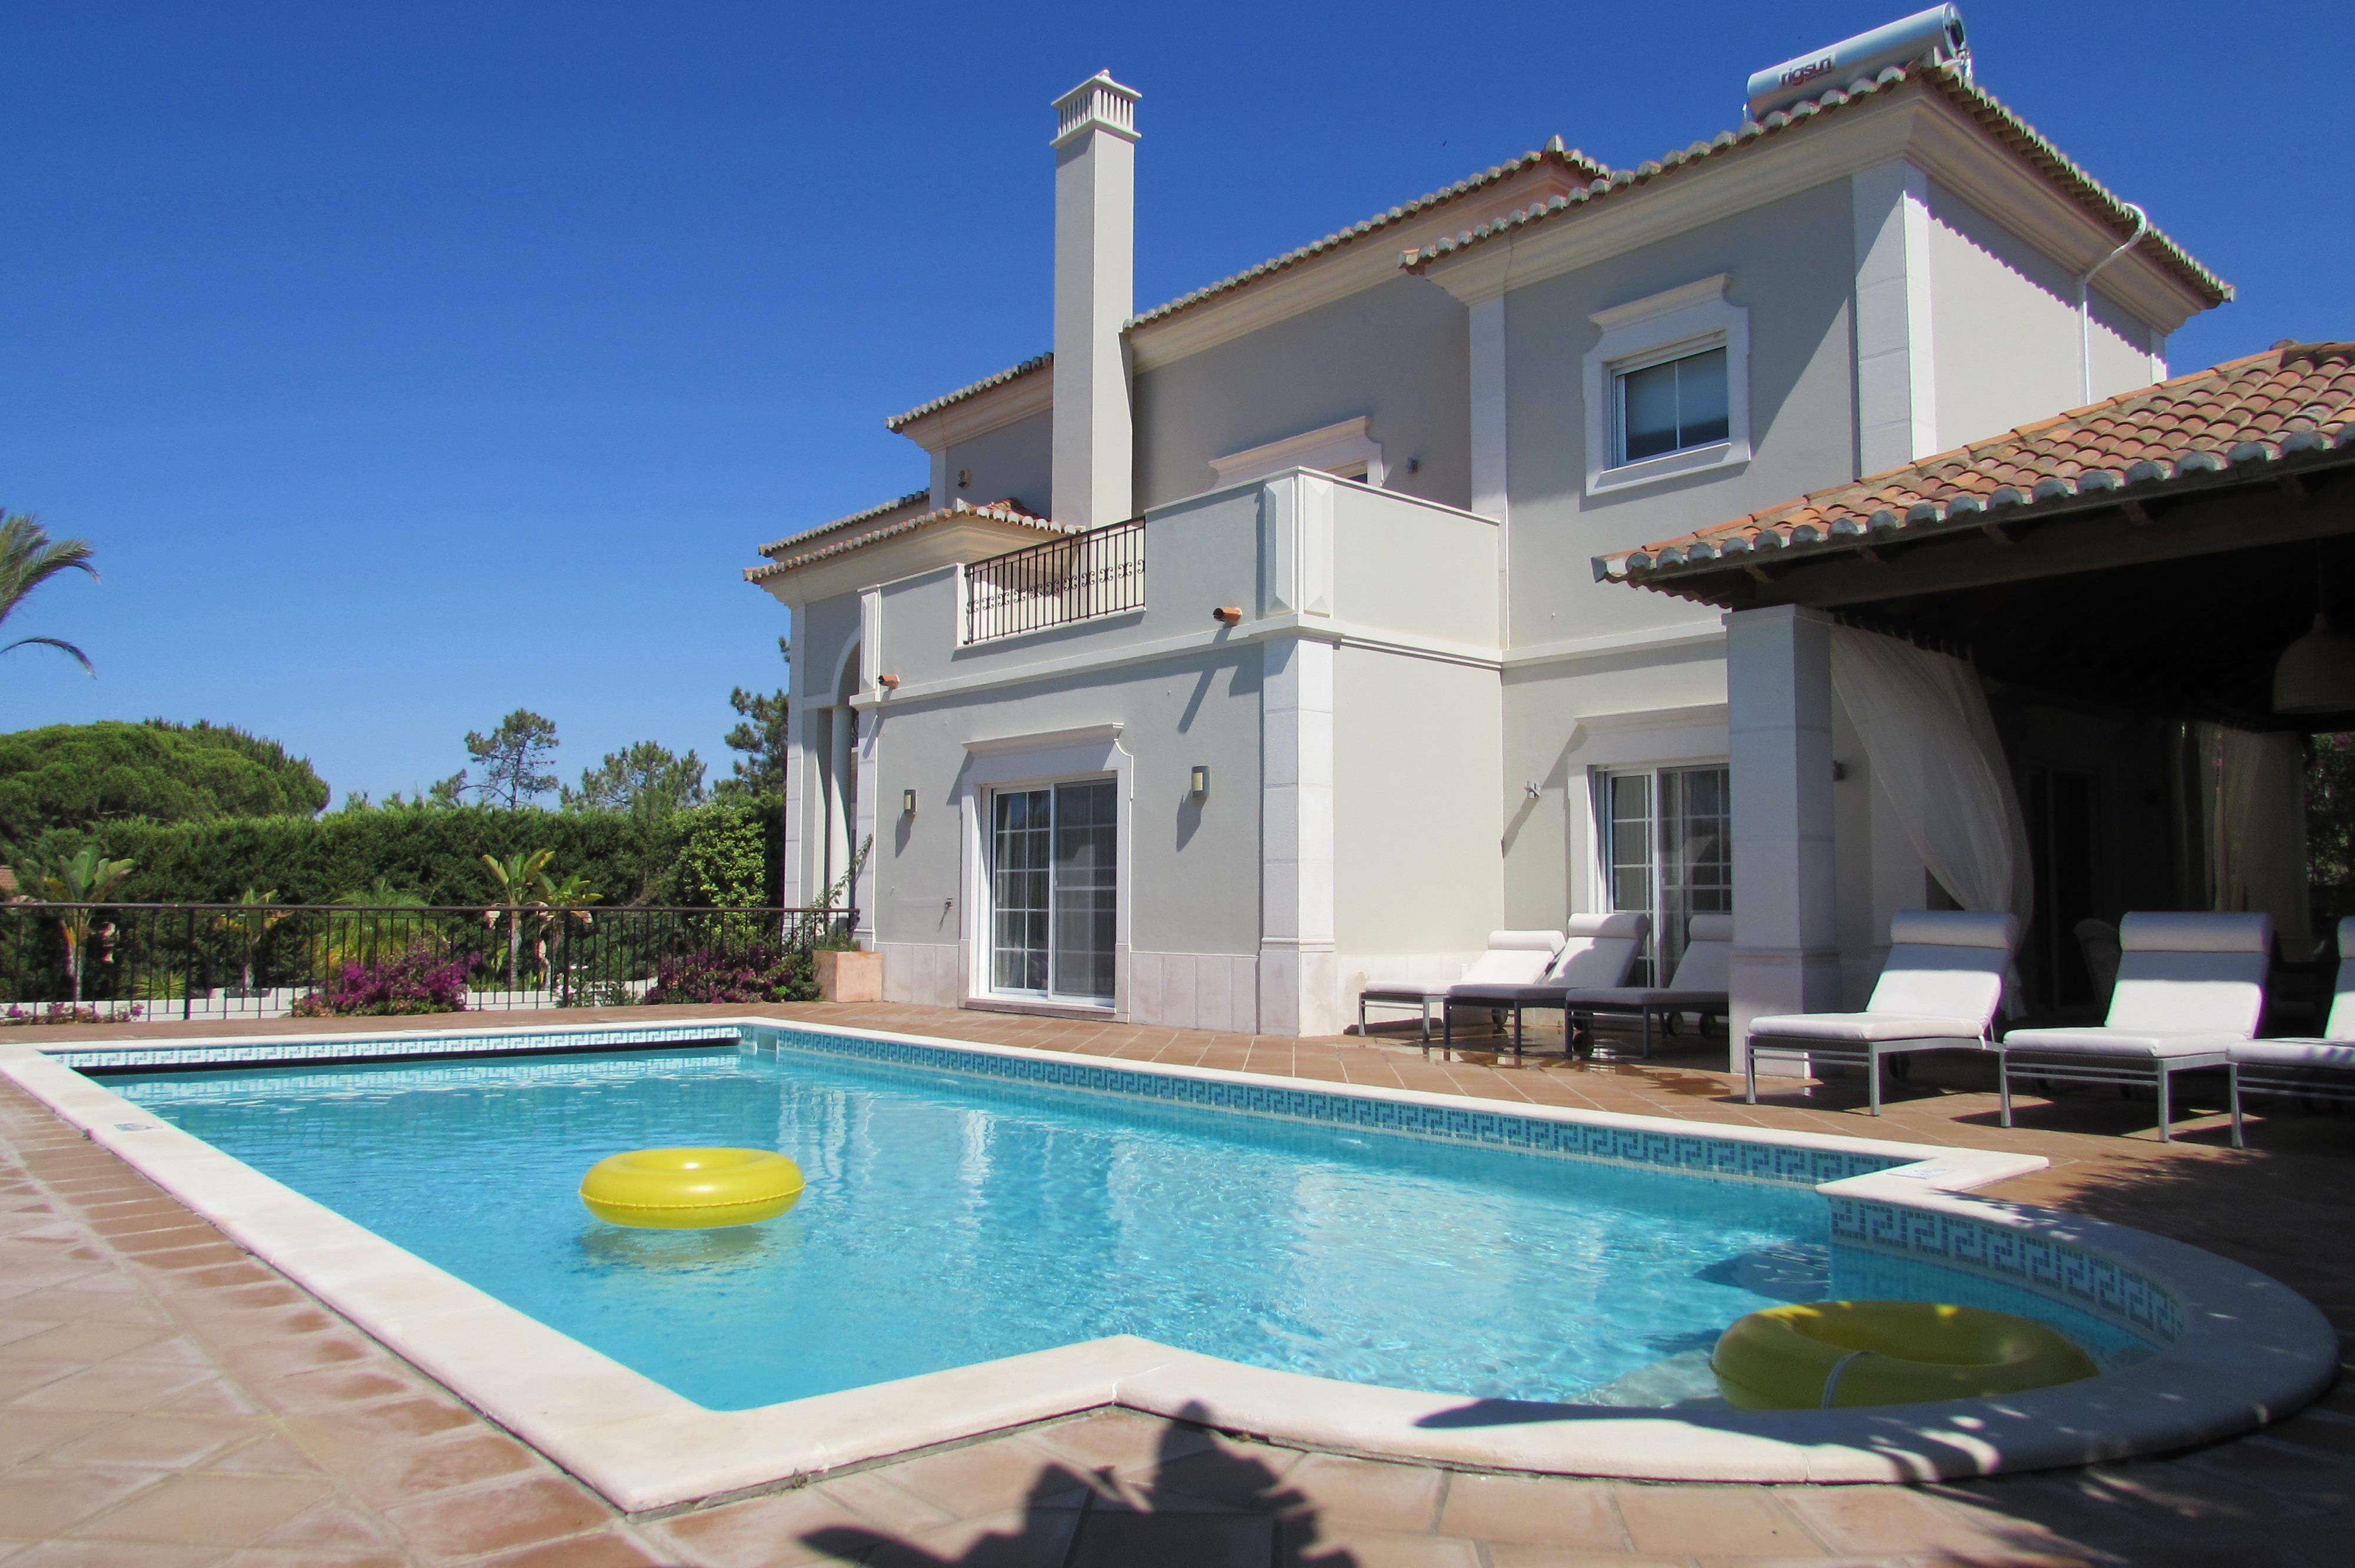 Casa para uma família para Venda às Detached house, 4 bedrooms, for Sale Loule, Algarve, Portugal